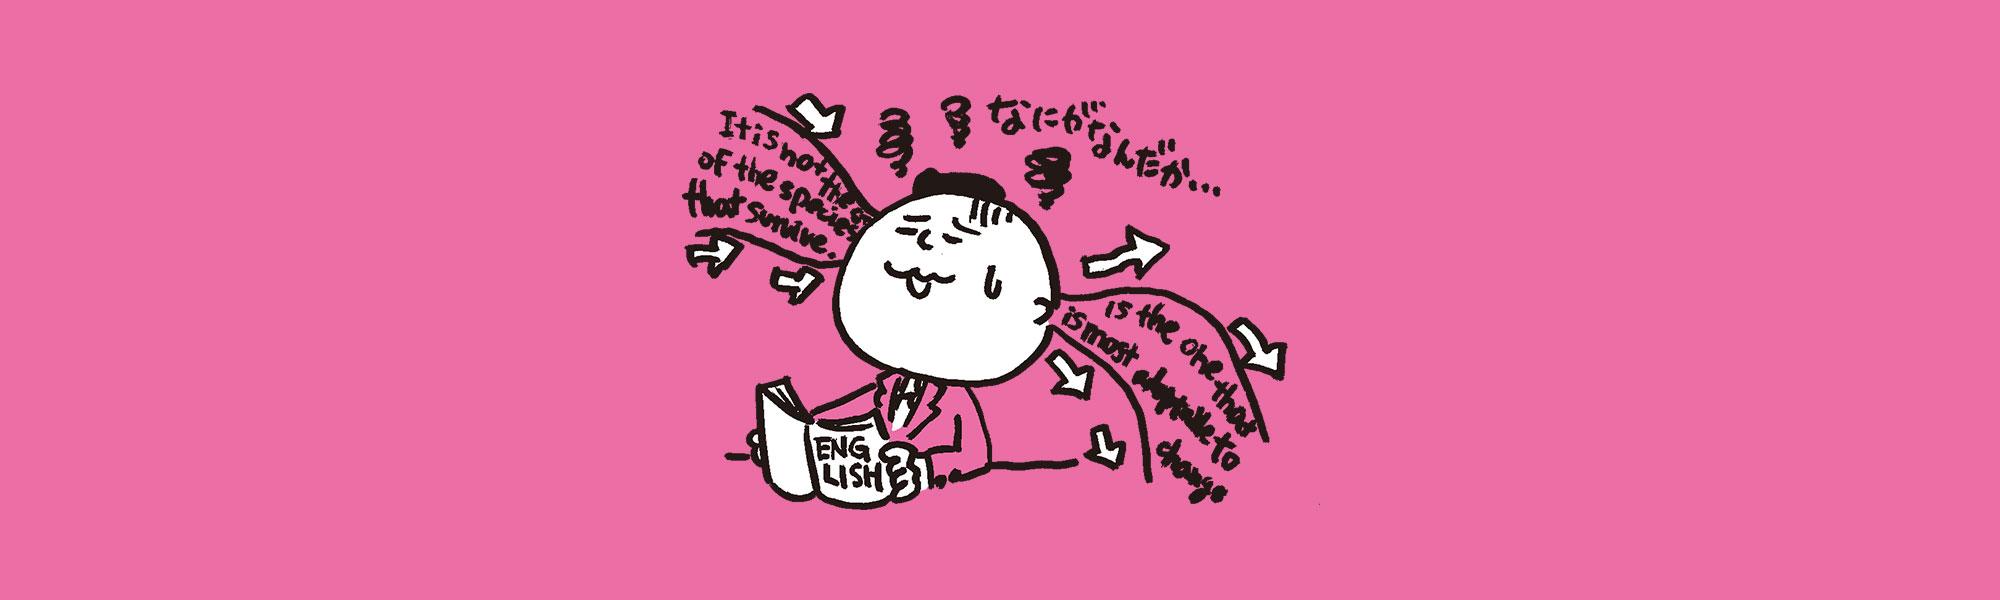 benesse_2017_illust_pink01